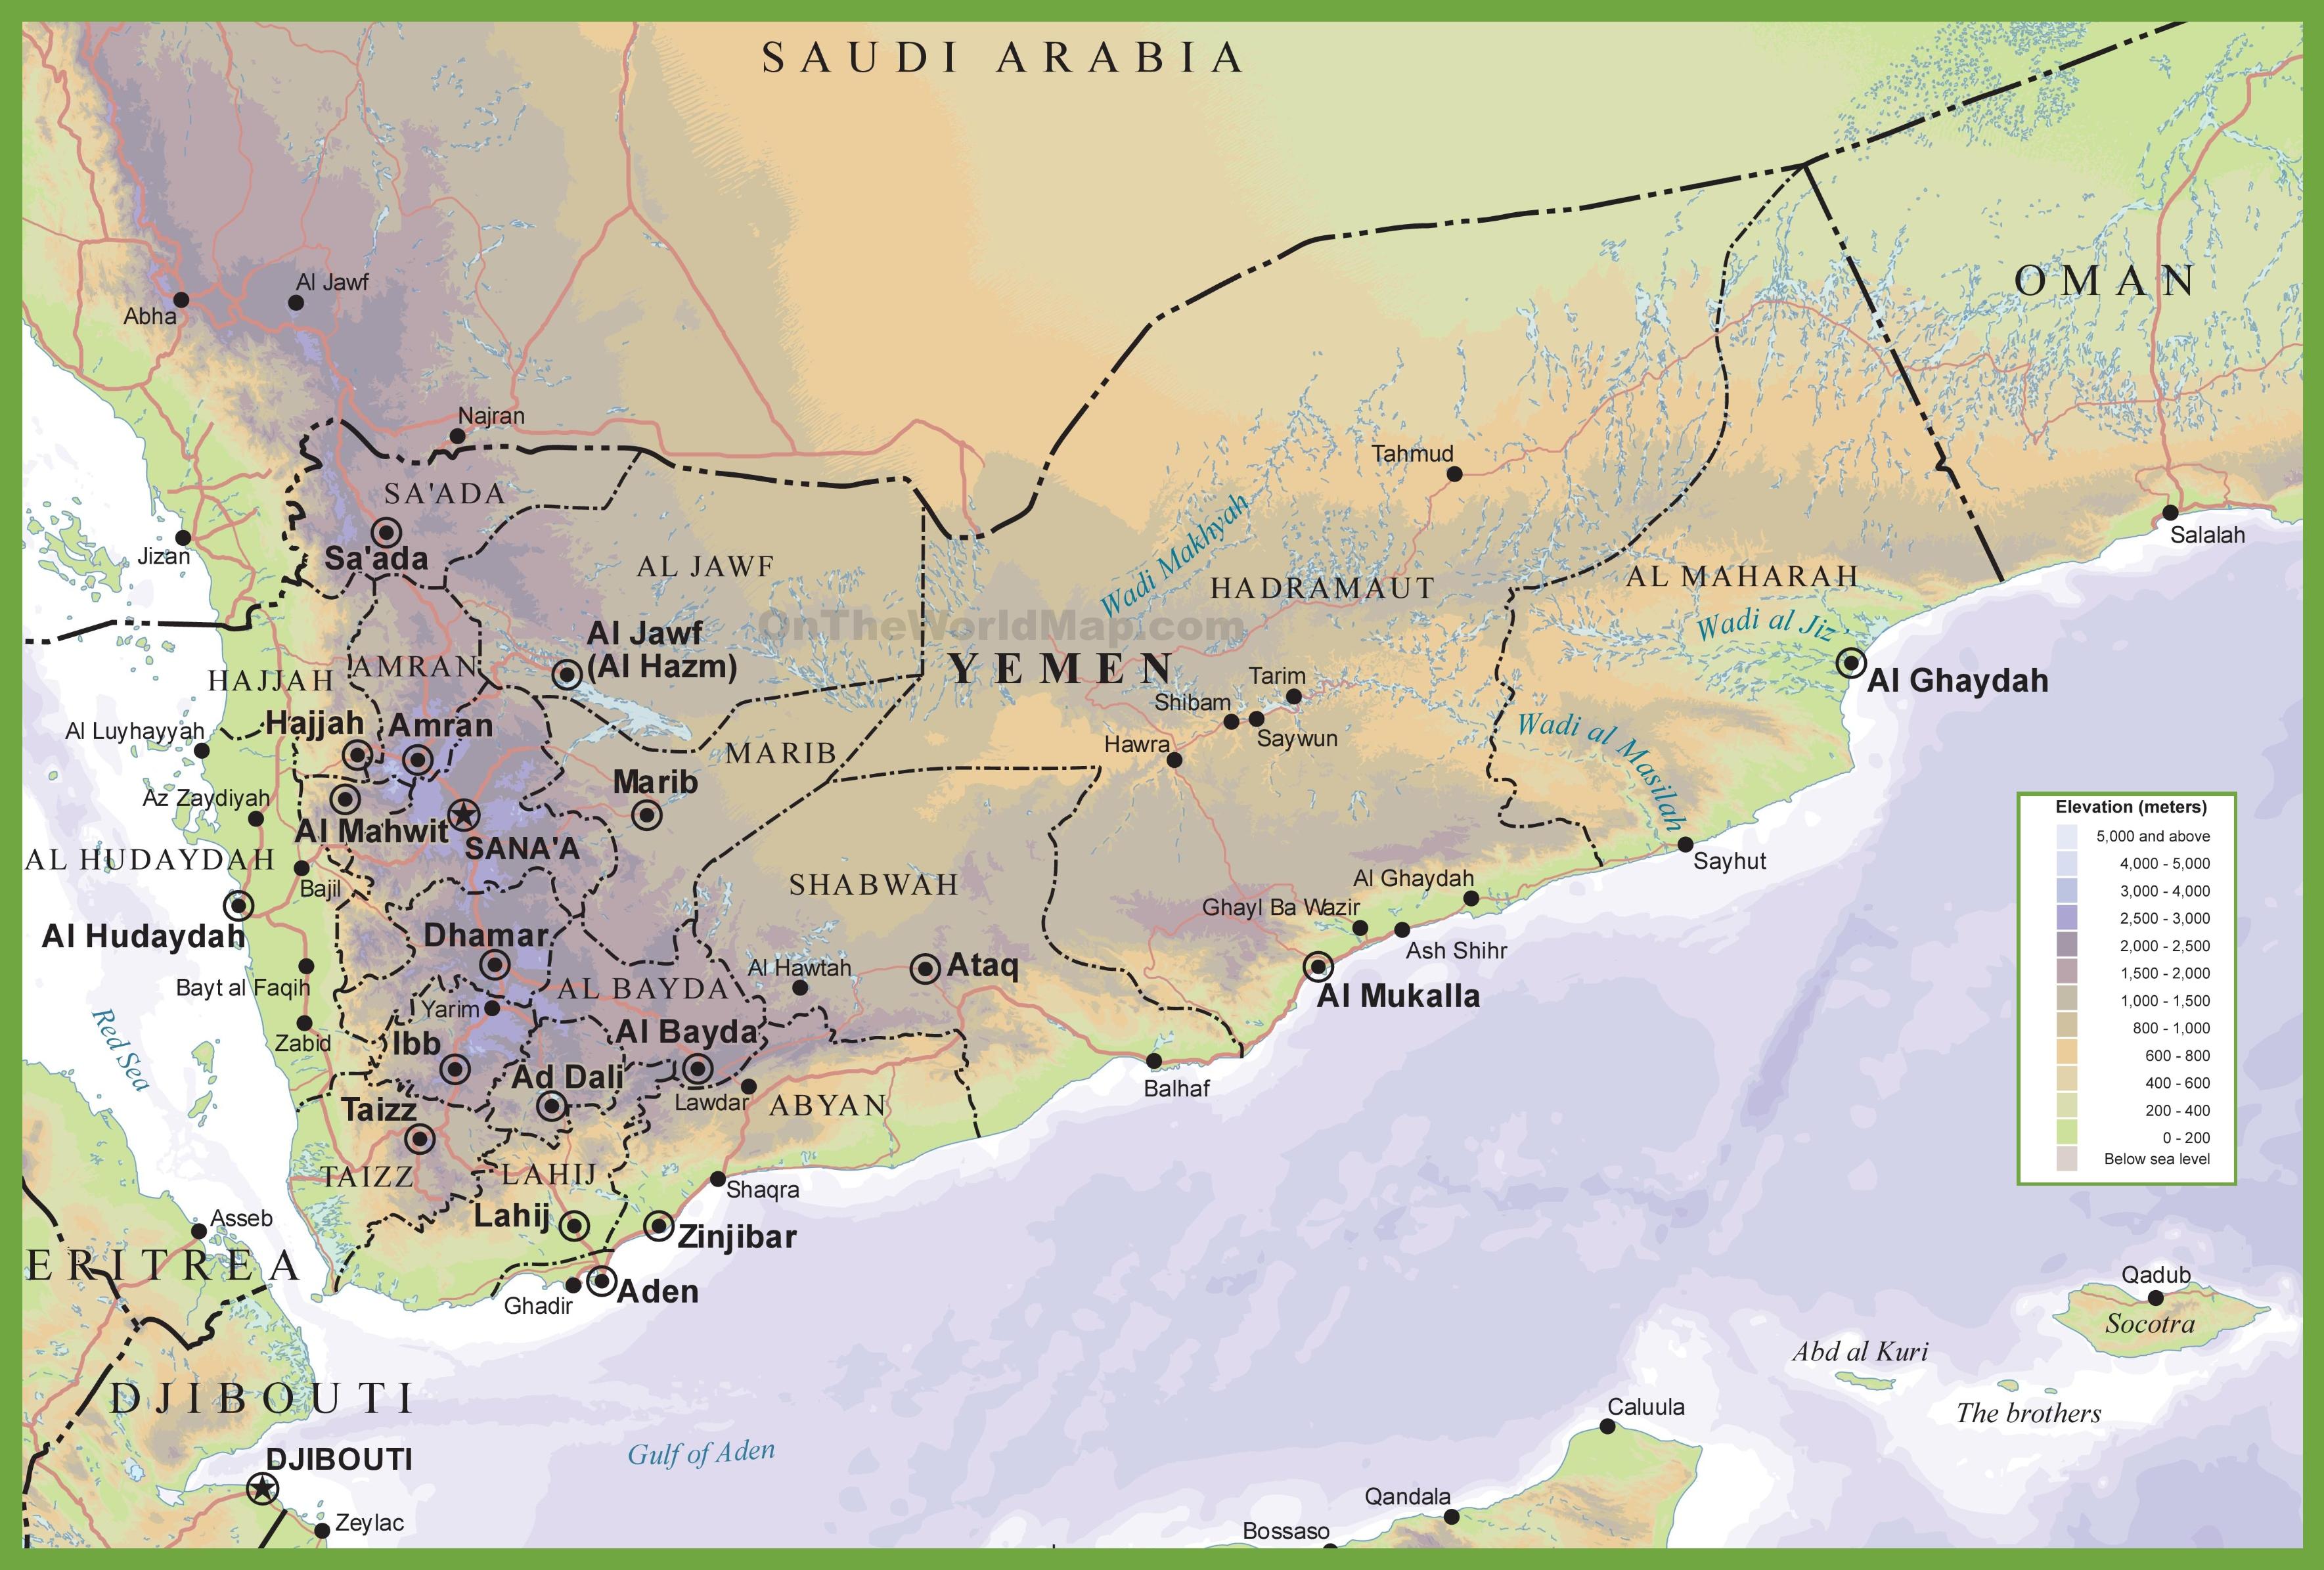 Yemen physical map  on physical geography of oman, palm jebel ali dubai, physical features of turkey, absolute location of dubai, climate of dubai, detailed map of dubai, culture of dubai, world map of dubai, map projection of dubai, global map of dubai, physical map uae, contour map of dubai, geological map of dubai, tourist map of dubai, map of middle east dubai, satellite map of dubai, population density map of dubai, earth map of dubai, show map dubai, blank map of dubai,